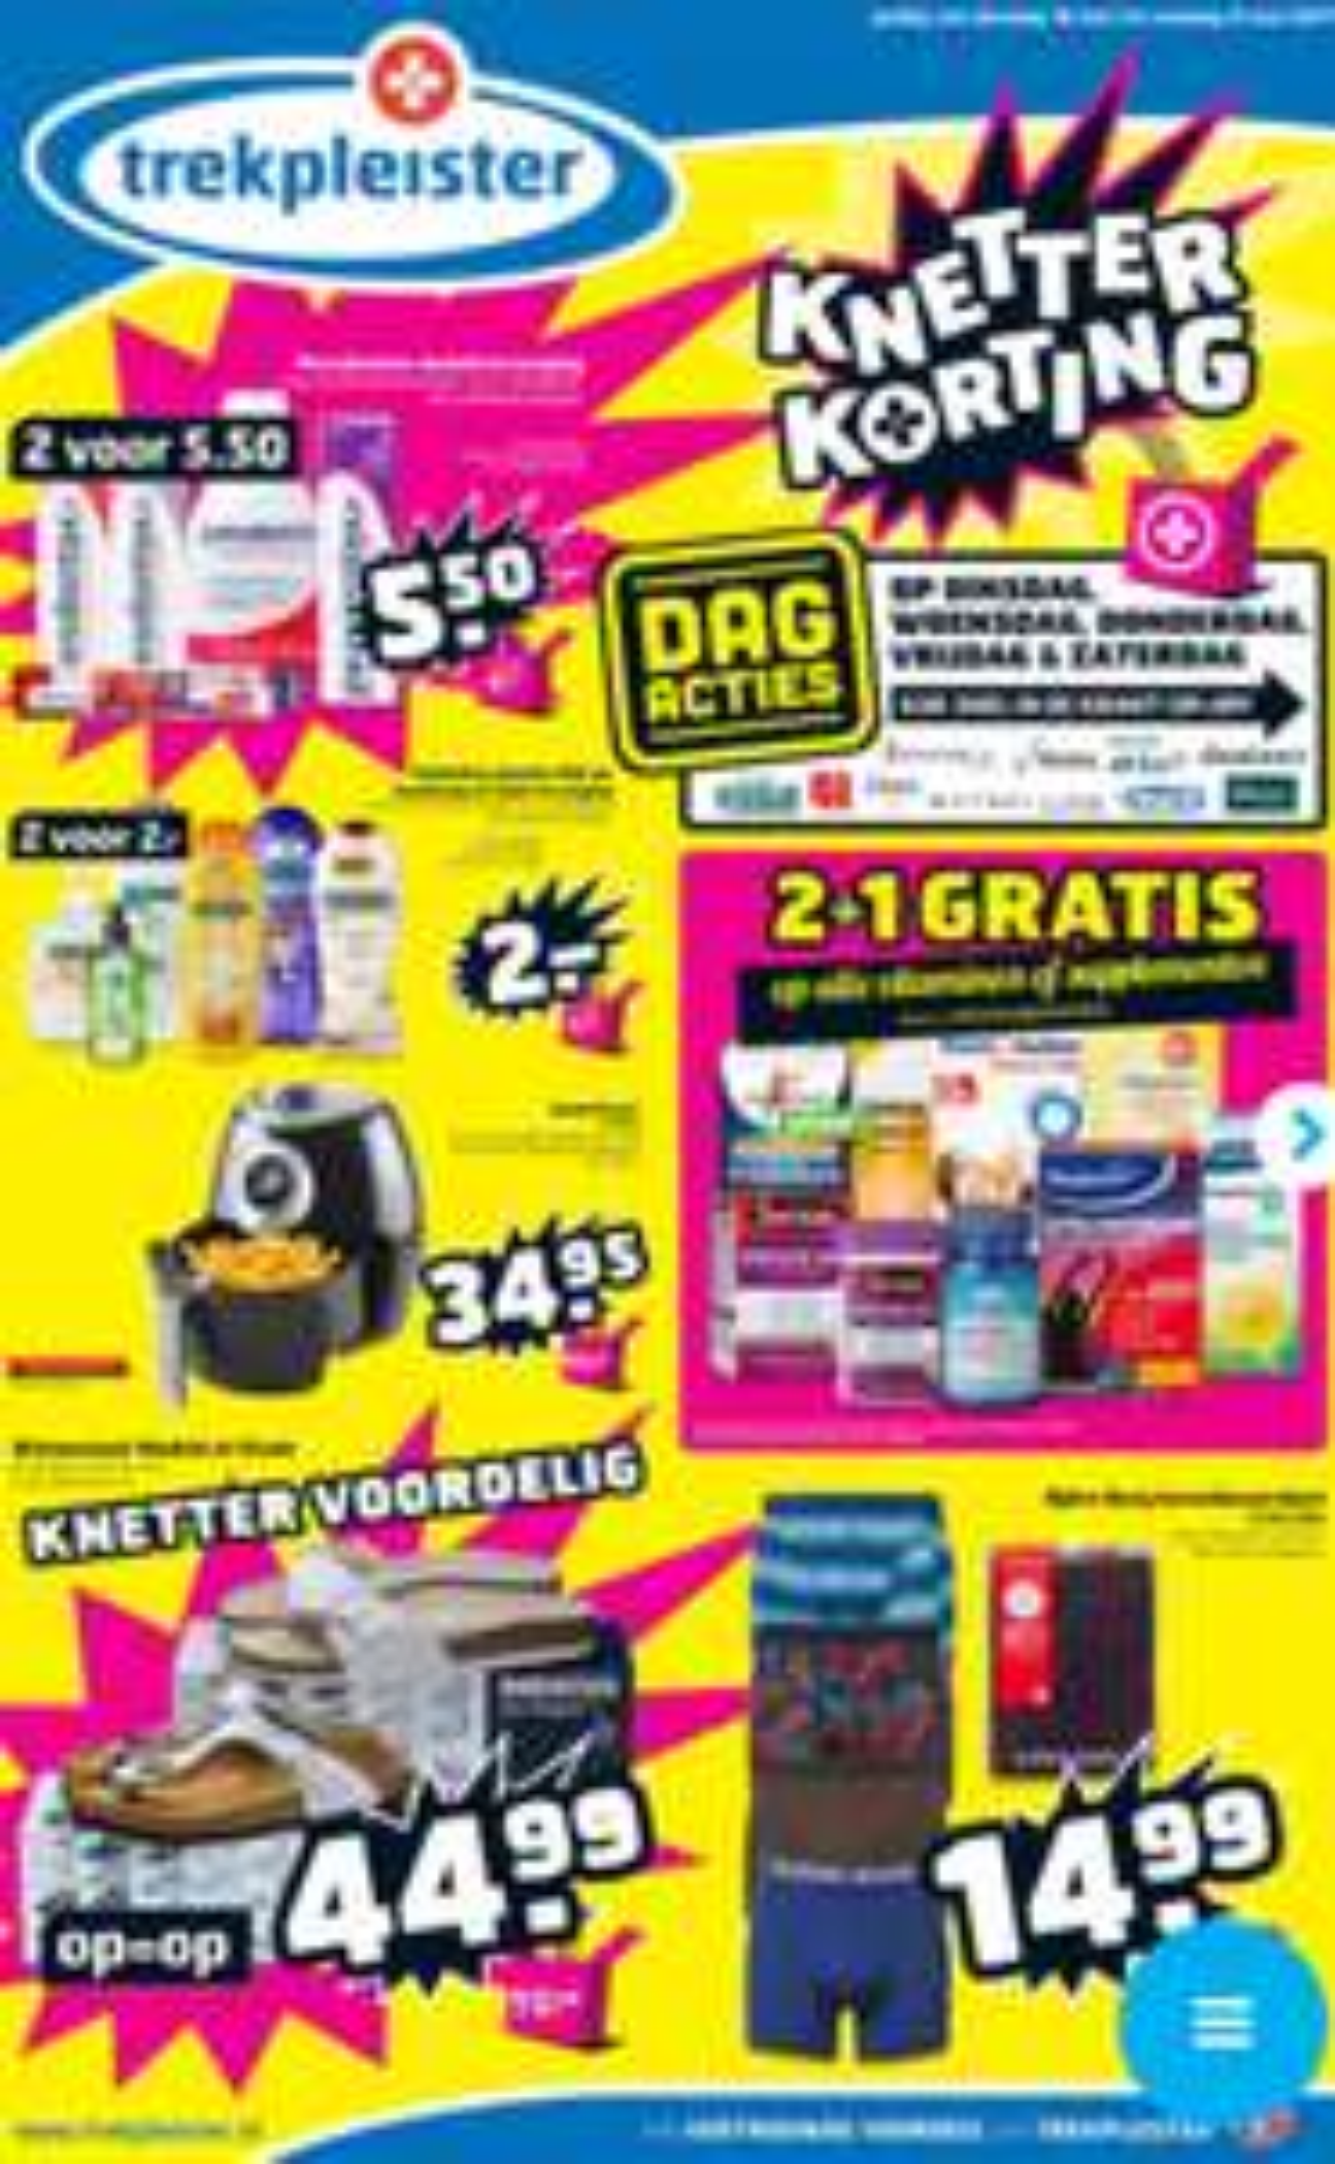 [REMINDER] Watshome smartfryer - €34,95 vanaf dinsdag @ Trekpleister